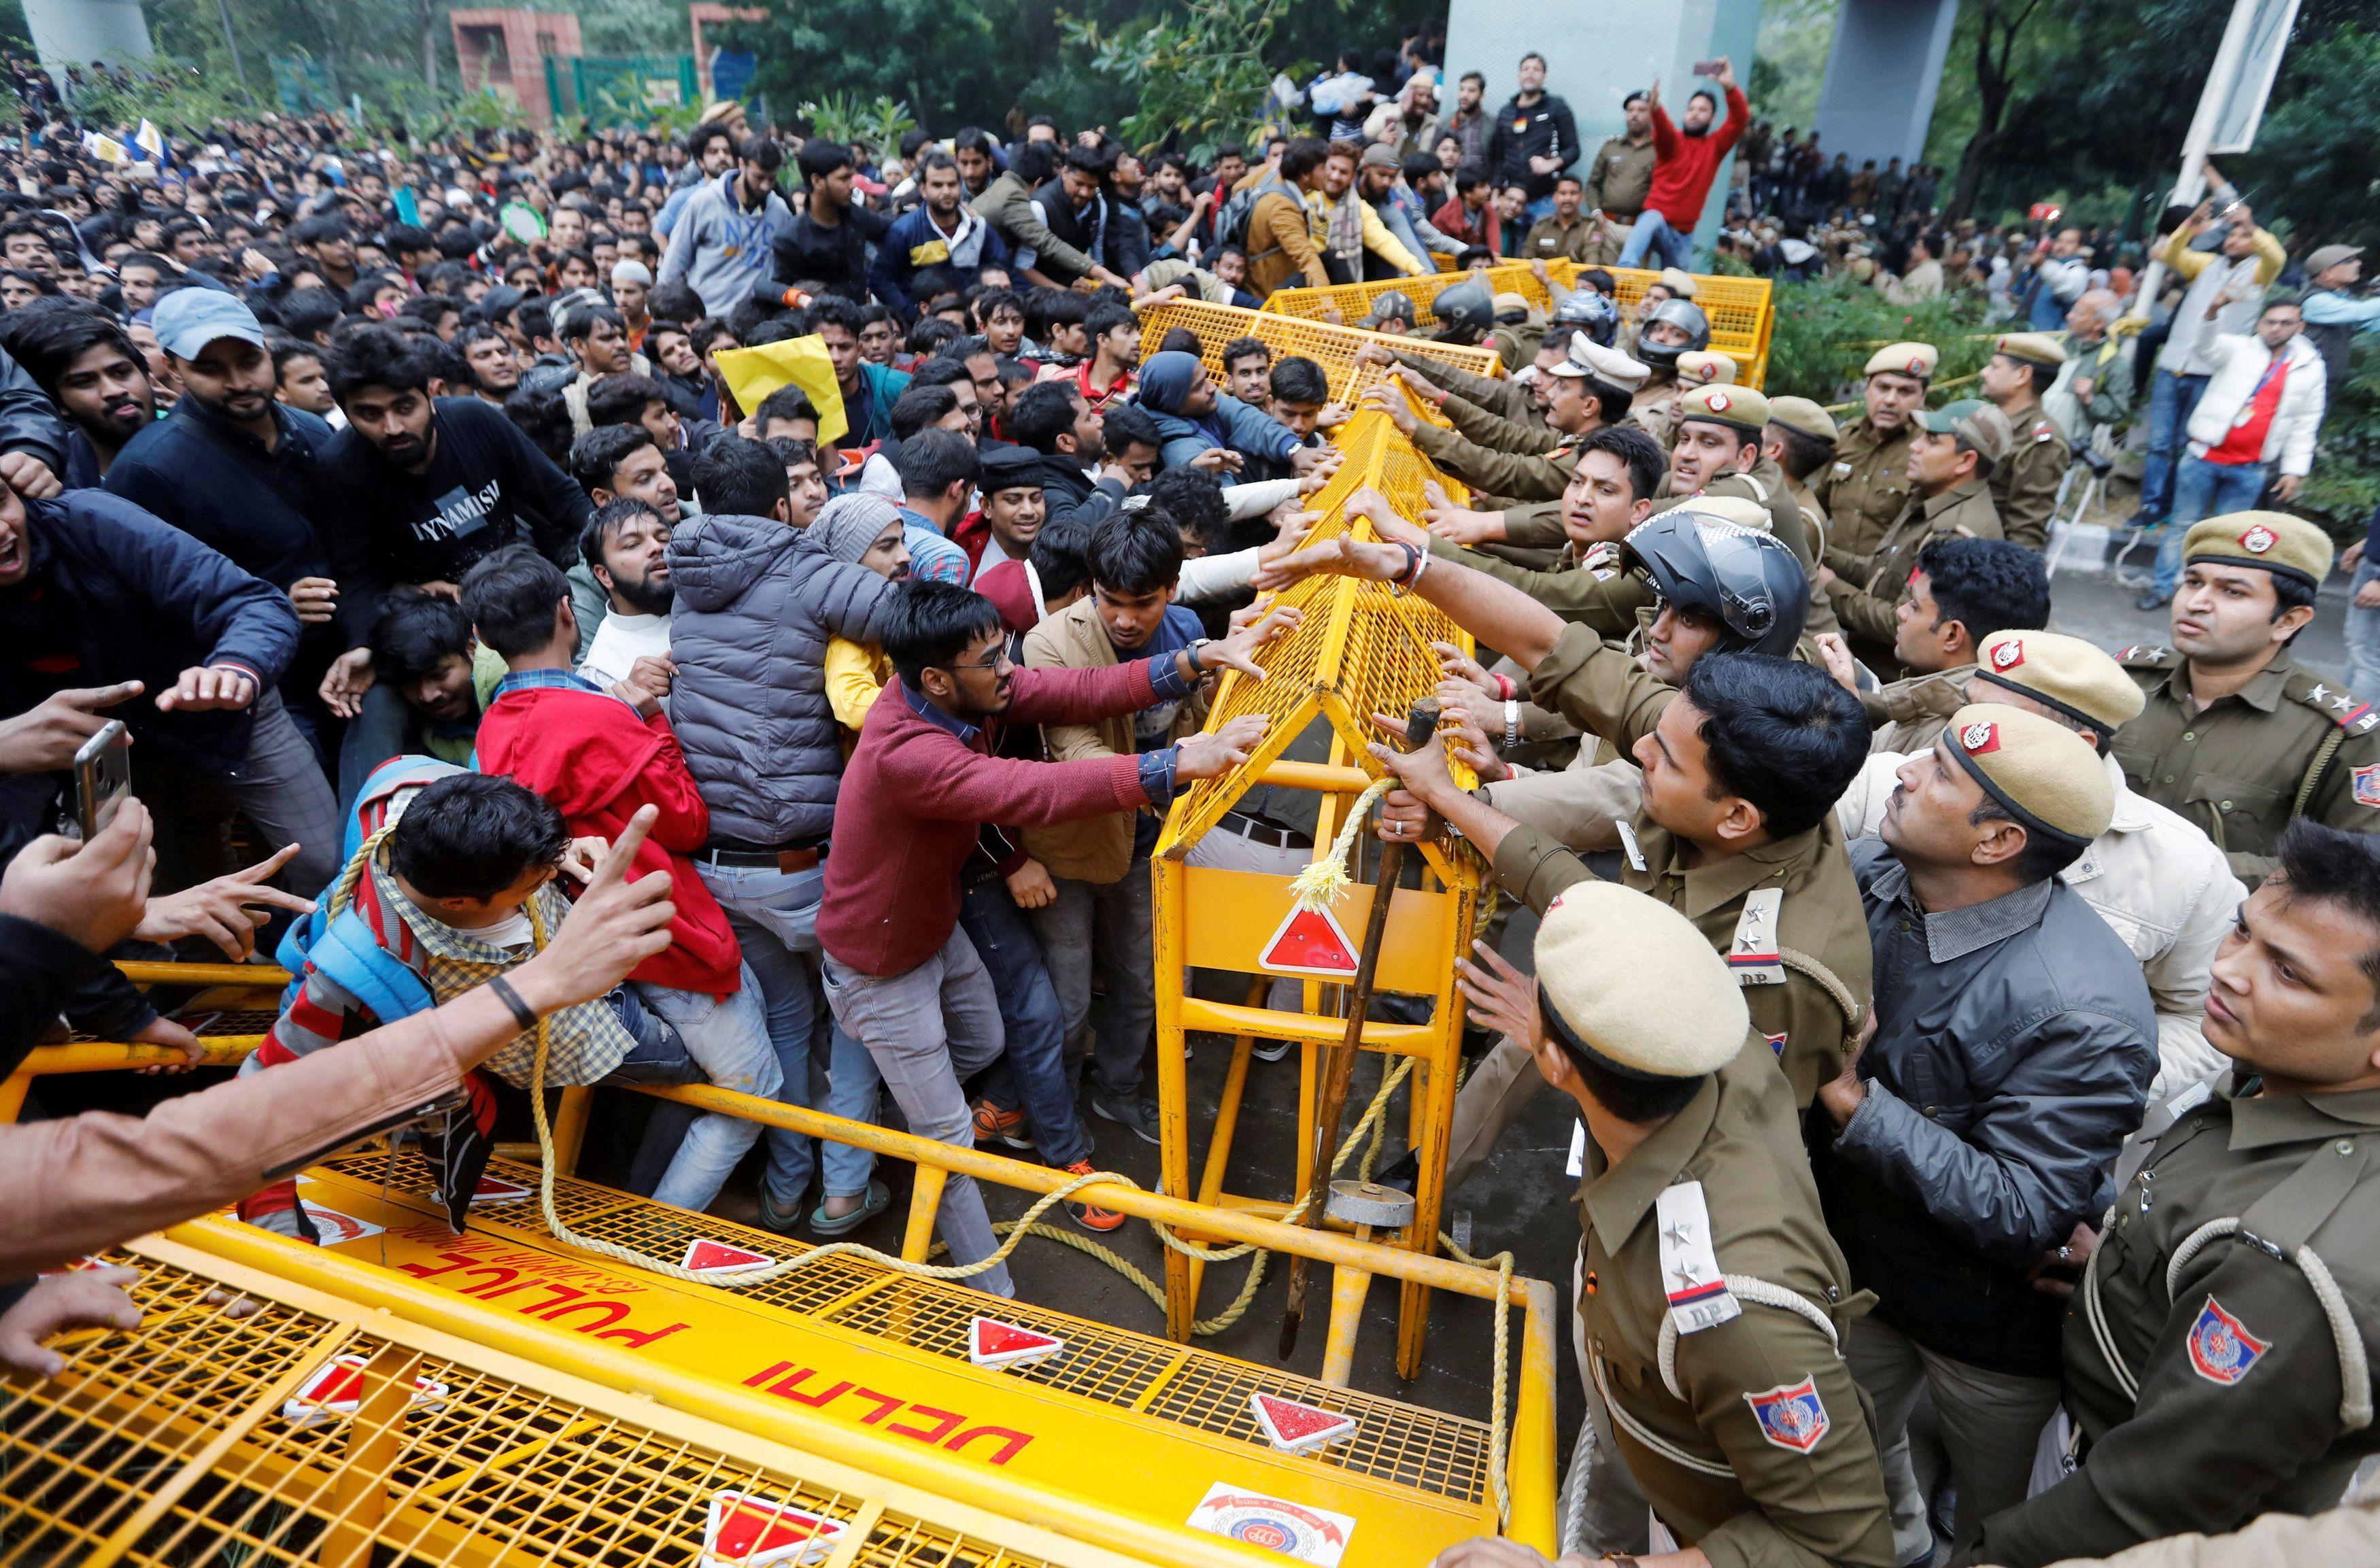 Clashes erupt in Delhi over citizenship law; Japan PM cancels visit